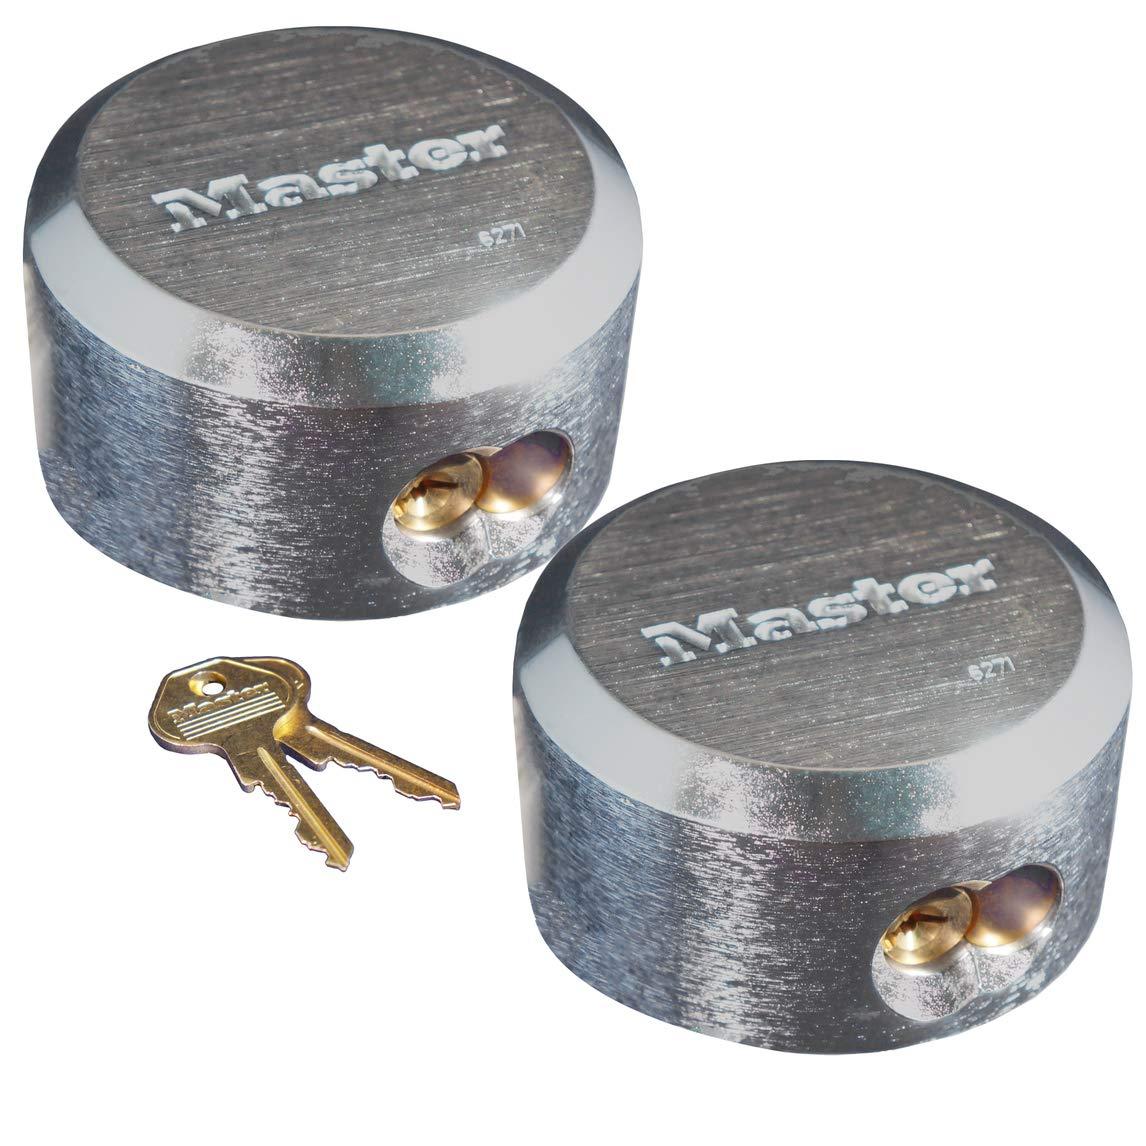 Master Lock 6271KA 2 Pack 2-7/8in. ProSeries Reinforced Hidden Shackle Rekeyable Pin Tumbler Keyed Alike Padlock, Chrome by Master Lock (Image #1)